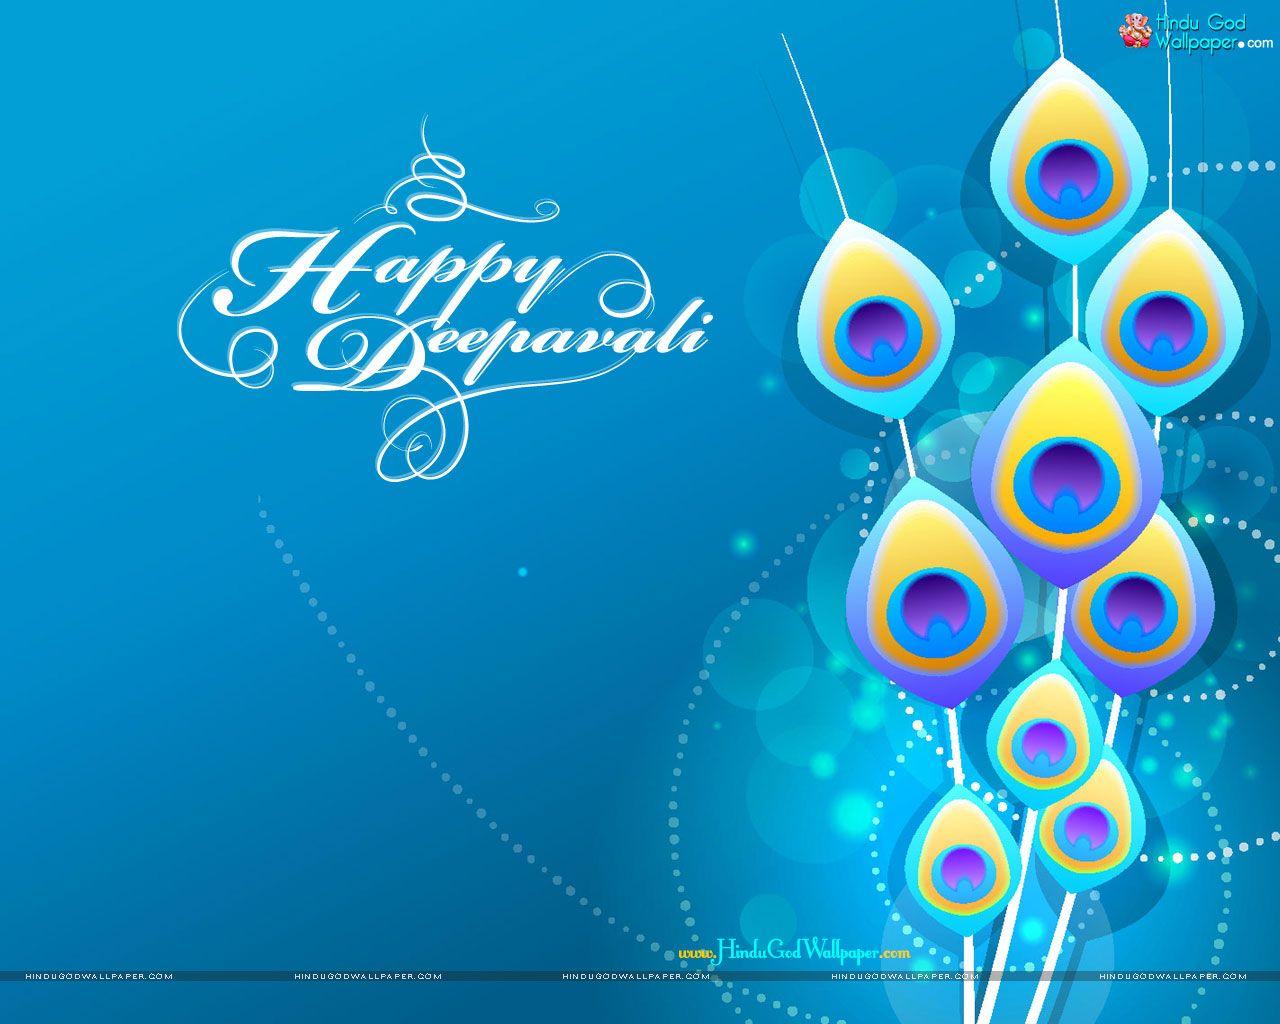 Beautiful Happy Deepavali Wallpaper HD Widescreen Download ... for Happy Deepavali Wallpaper Hd Widescreen  66plt